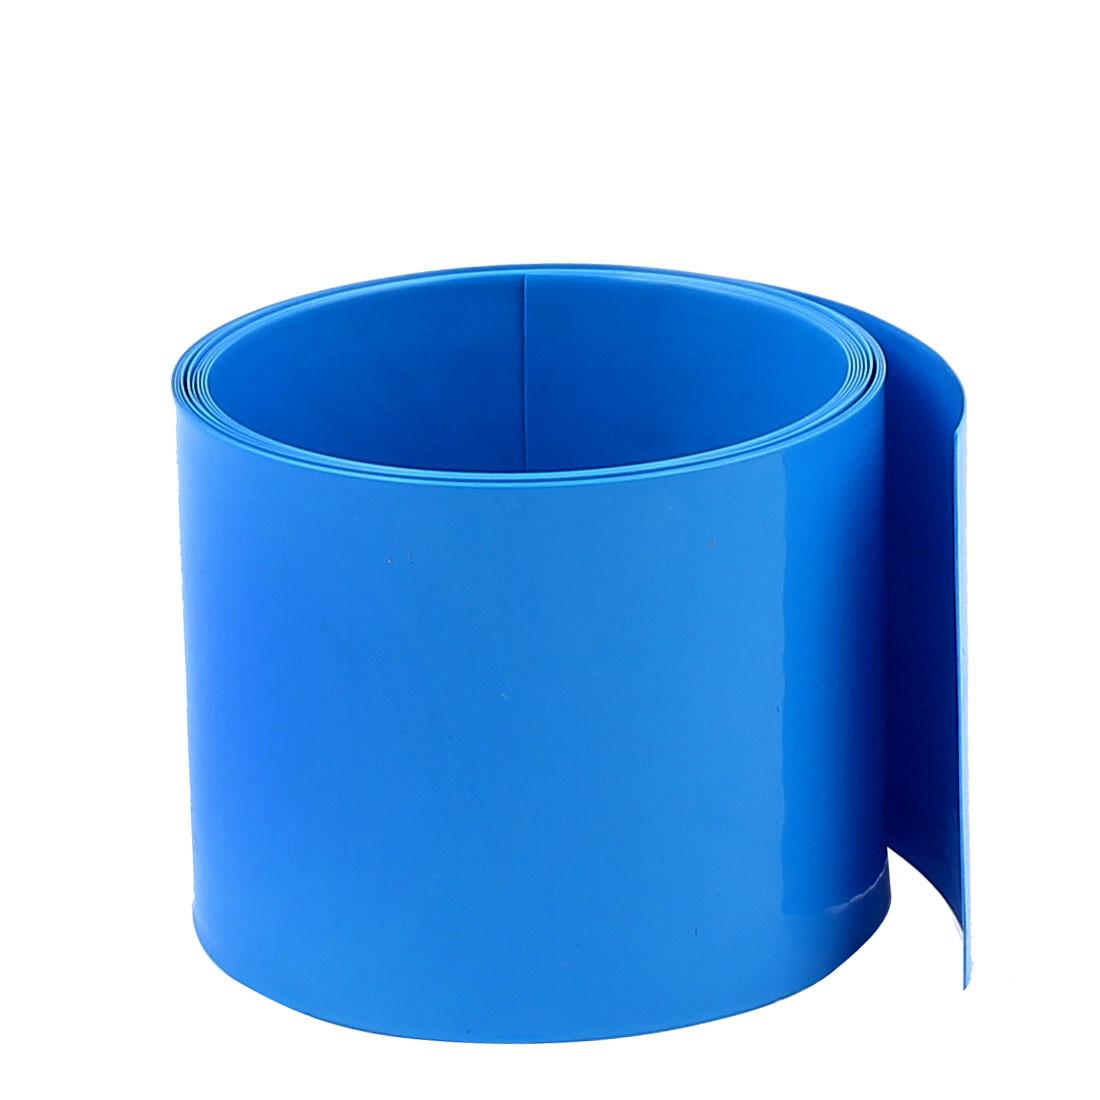 6.6ft 60mm Flat 38mm Dia PVC Heat Shrink Tubing Blue for 18650 Battery